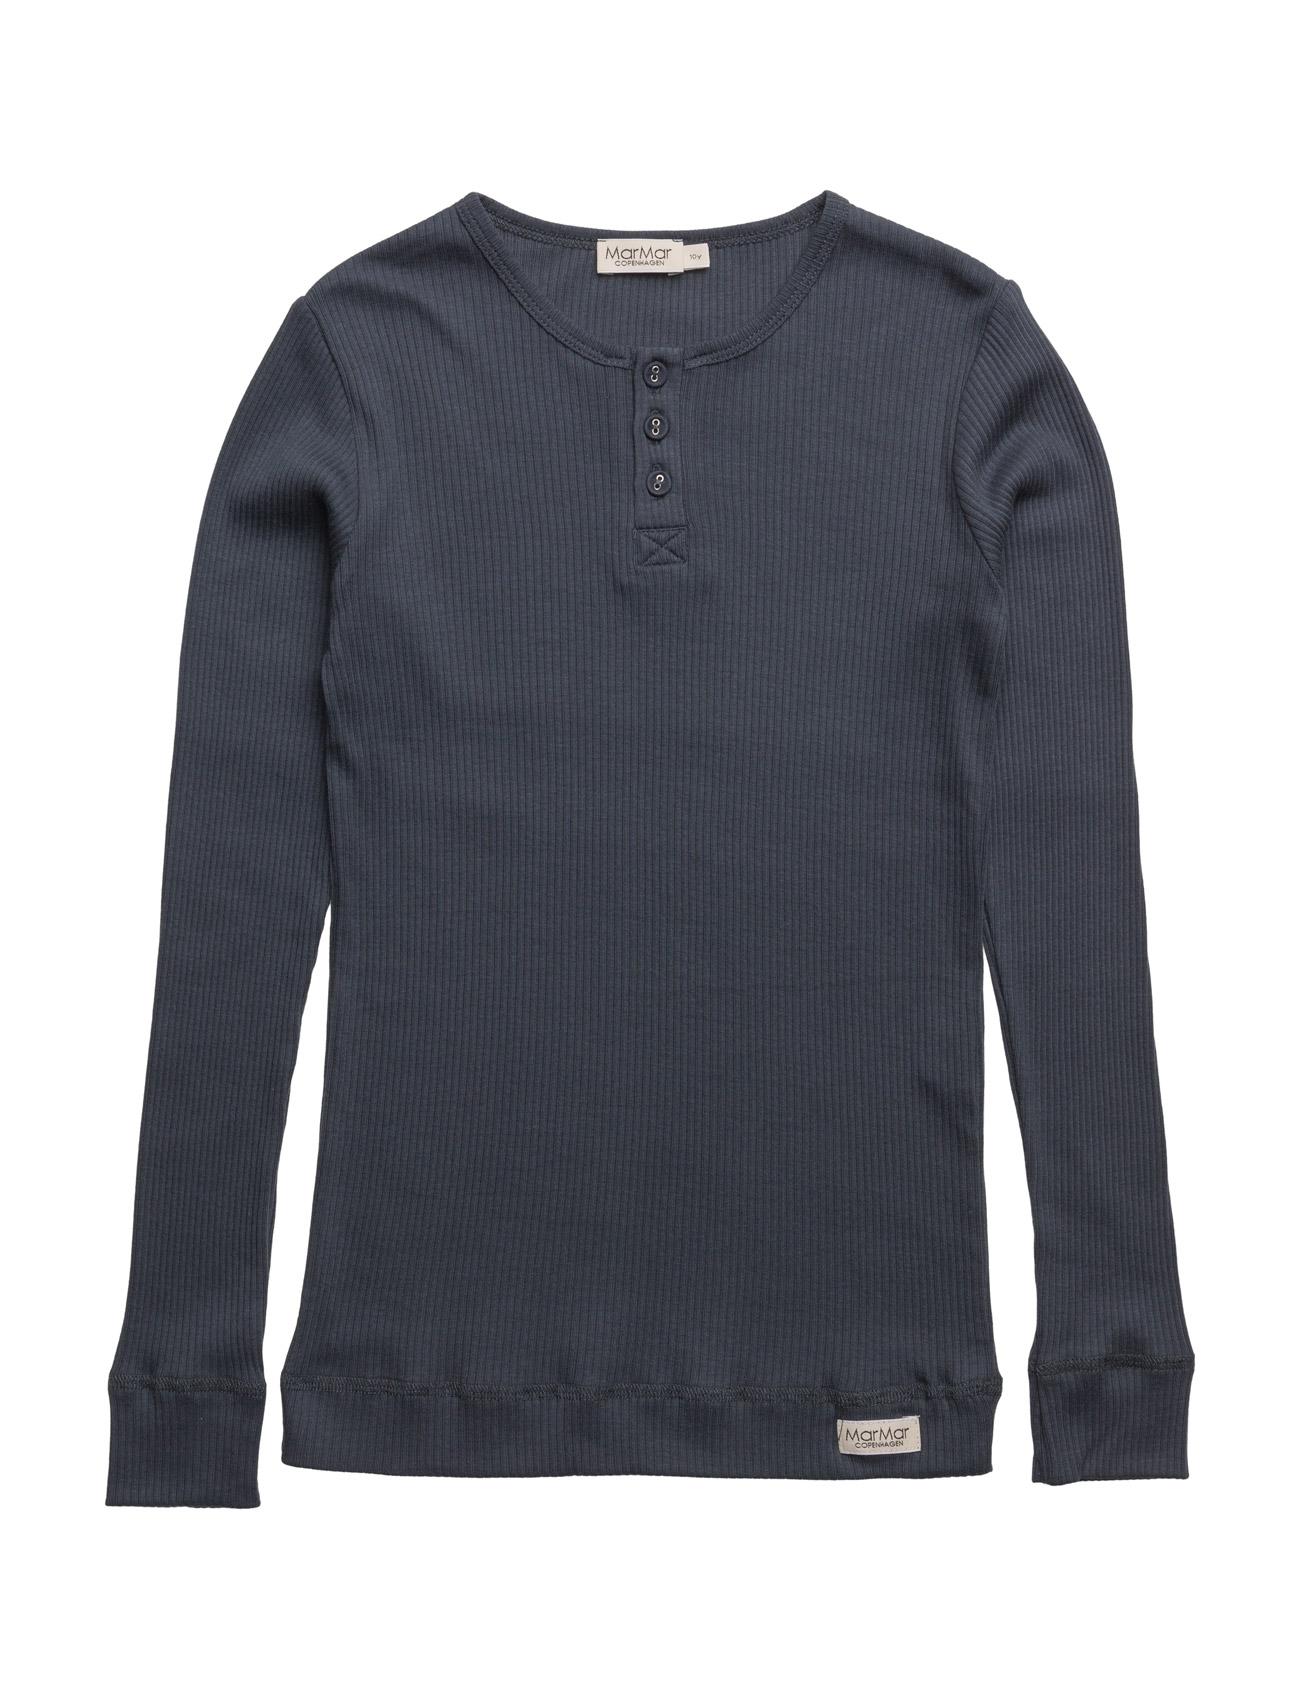 Tee Ls MarMar Cph T-shirts til Børn i Blå